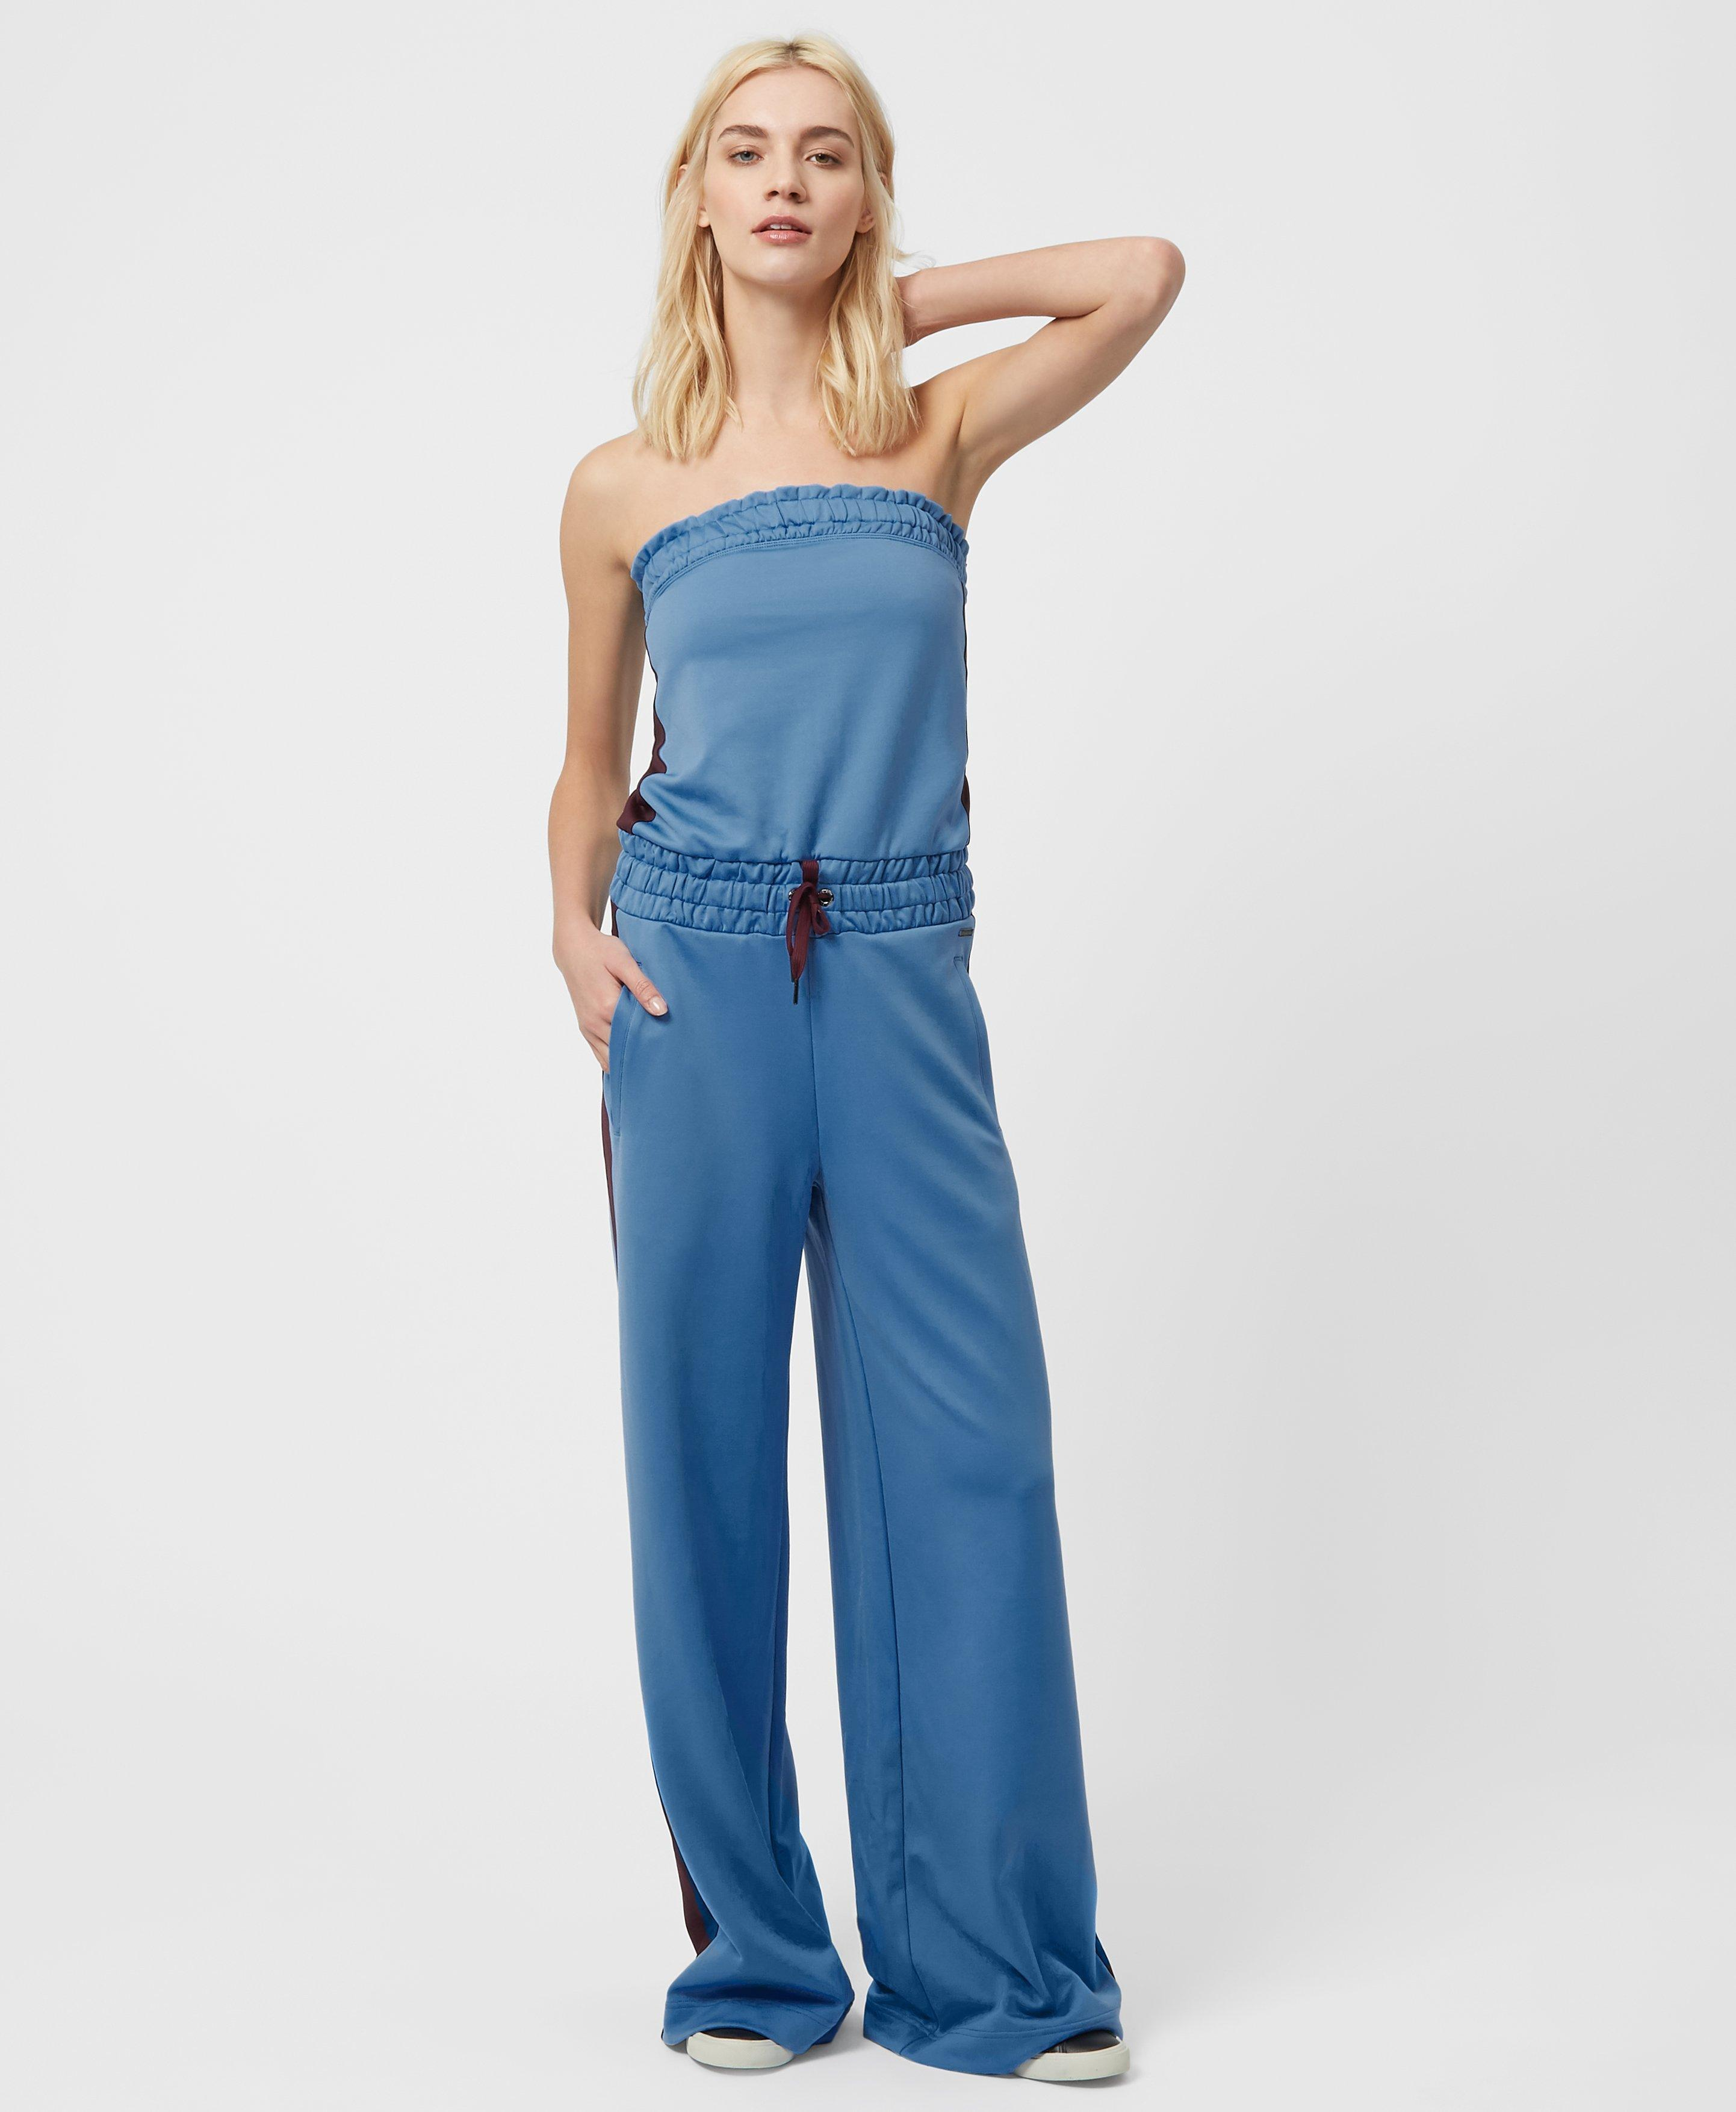 c5b7fd6601b Lyst - Sweaty Betty Donna Jumpsuit in Blue